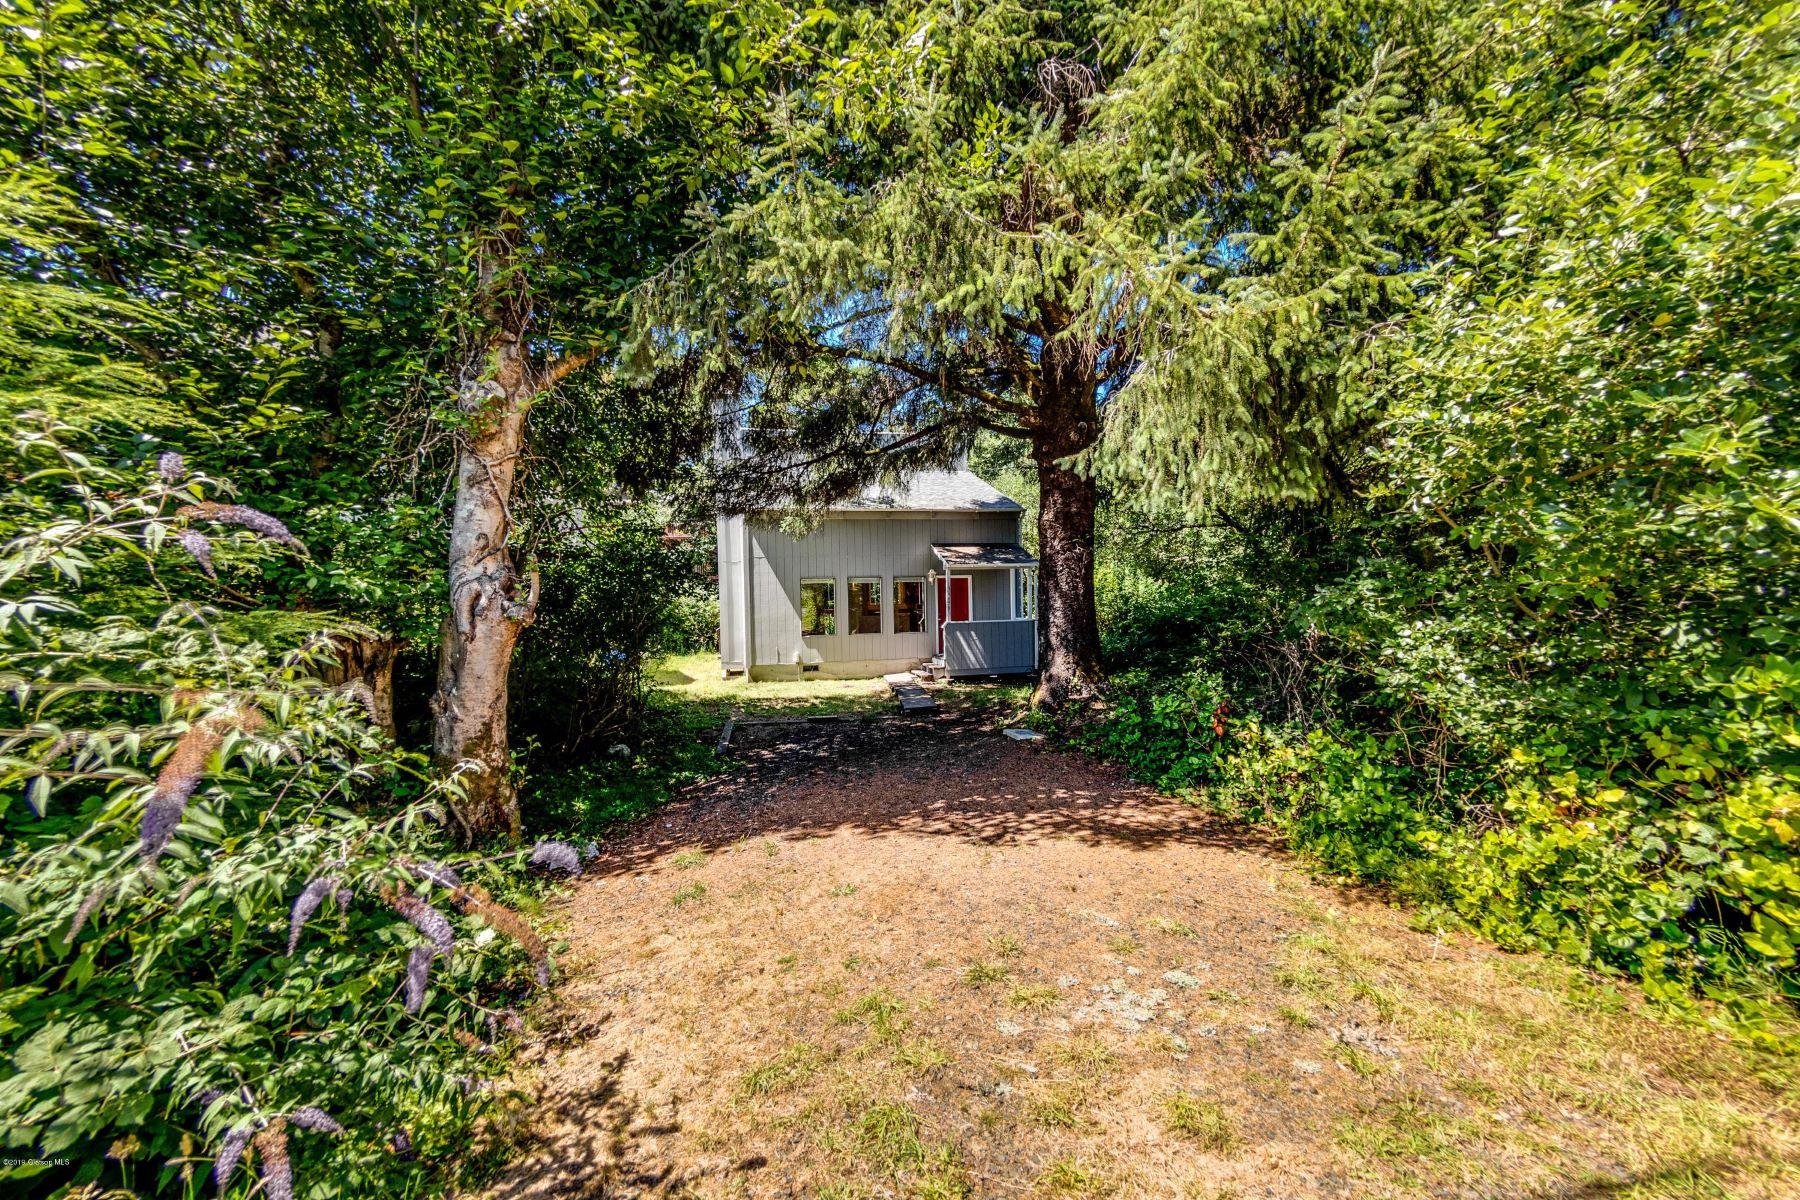 Other Residential Homes για την Πώληση στο 34450 Necarney Blvd Manzanita, OR 97130 Manzanita, Ορεγκον 97130 Ηνωμένες Πολιτείες